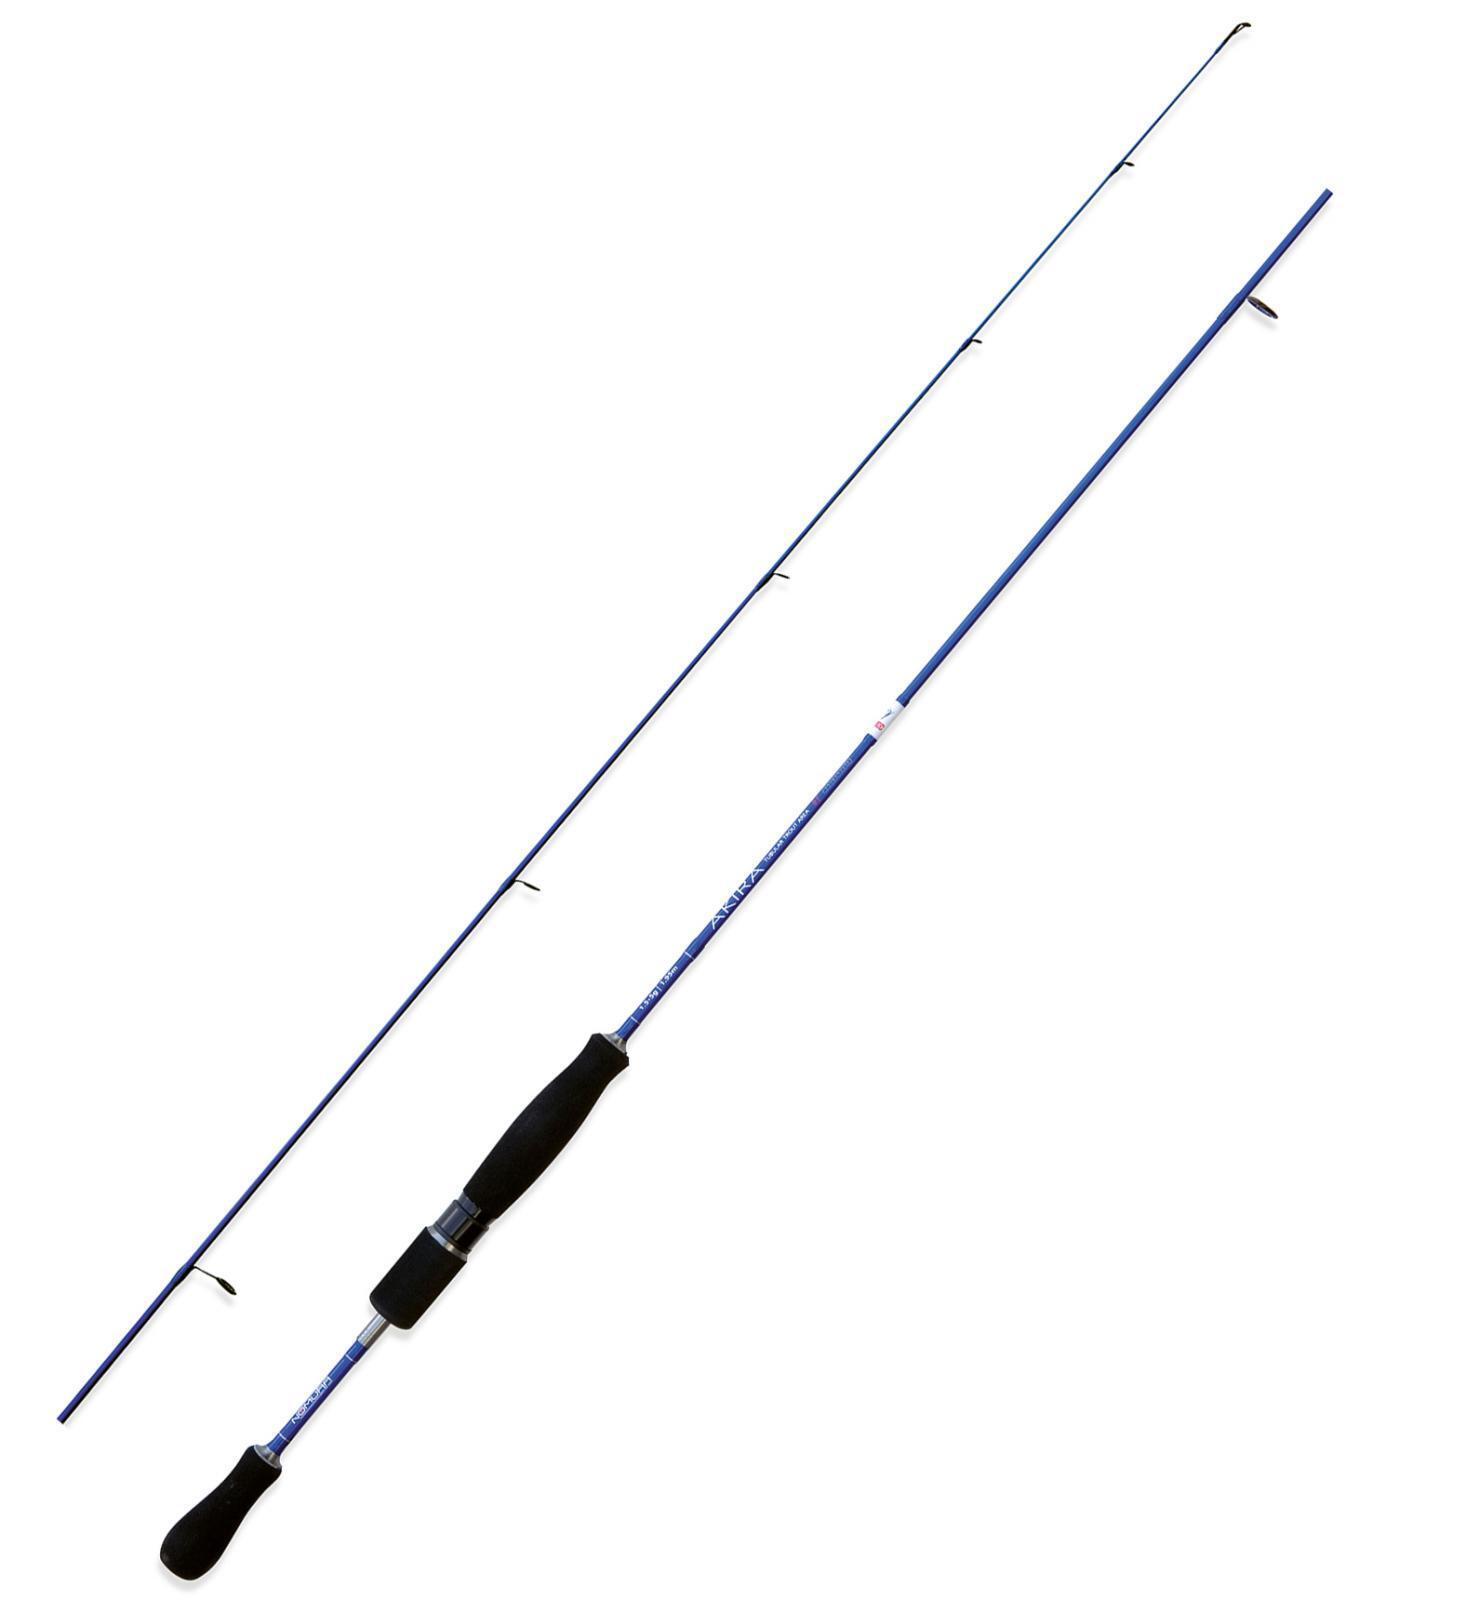 NM20540317 Nomura Canna pesca Trout Area Akira tubolar 1,76 0,5-3.5gr       RNG